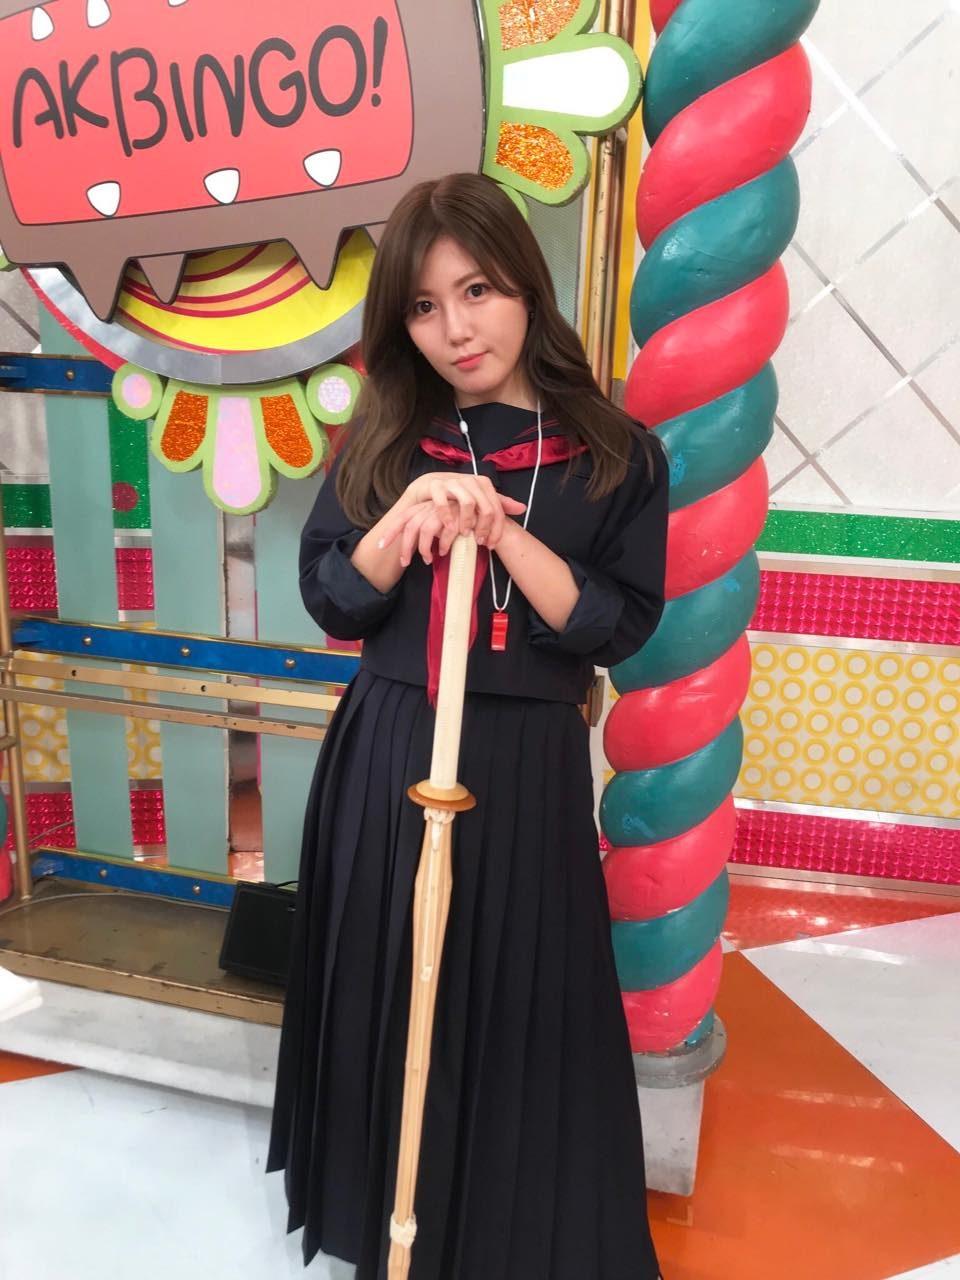 AKB48歴12年、宮崎パイセンのバラエティ特訓塾完結 日テレ「AKBINGO!」 [4/16 24:59~]